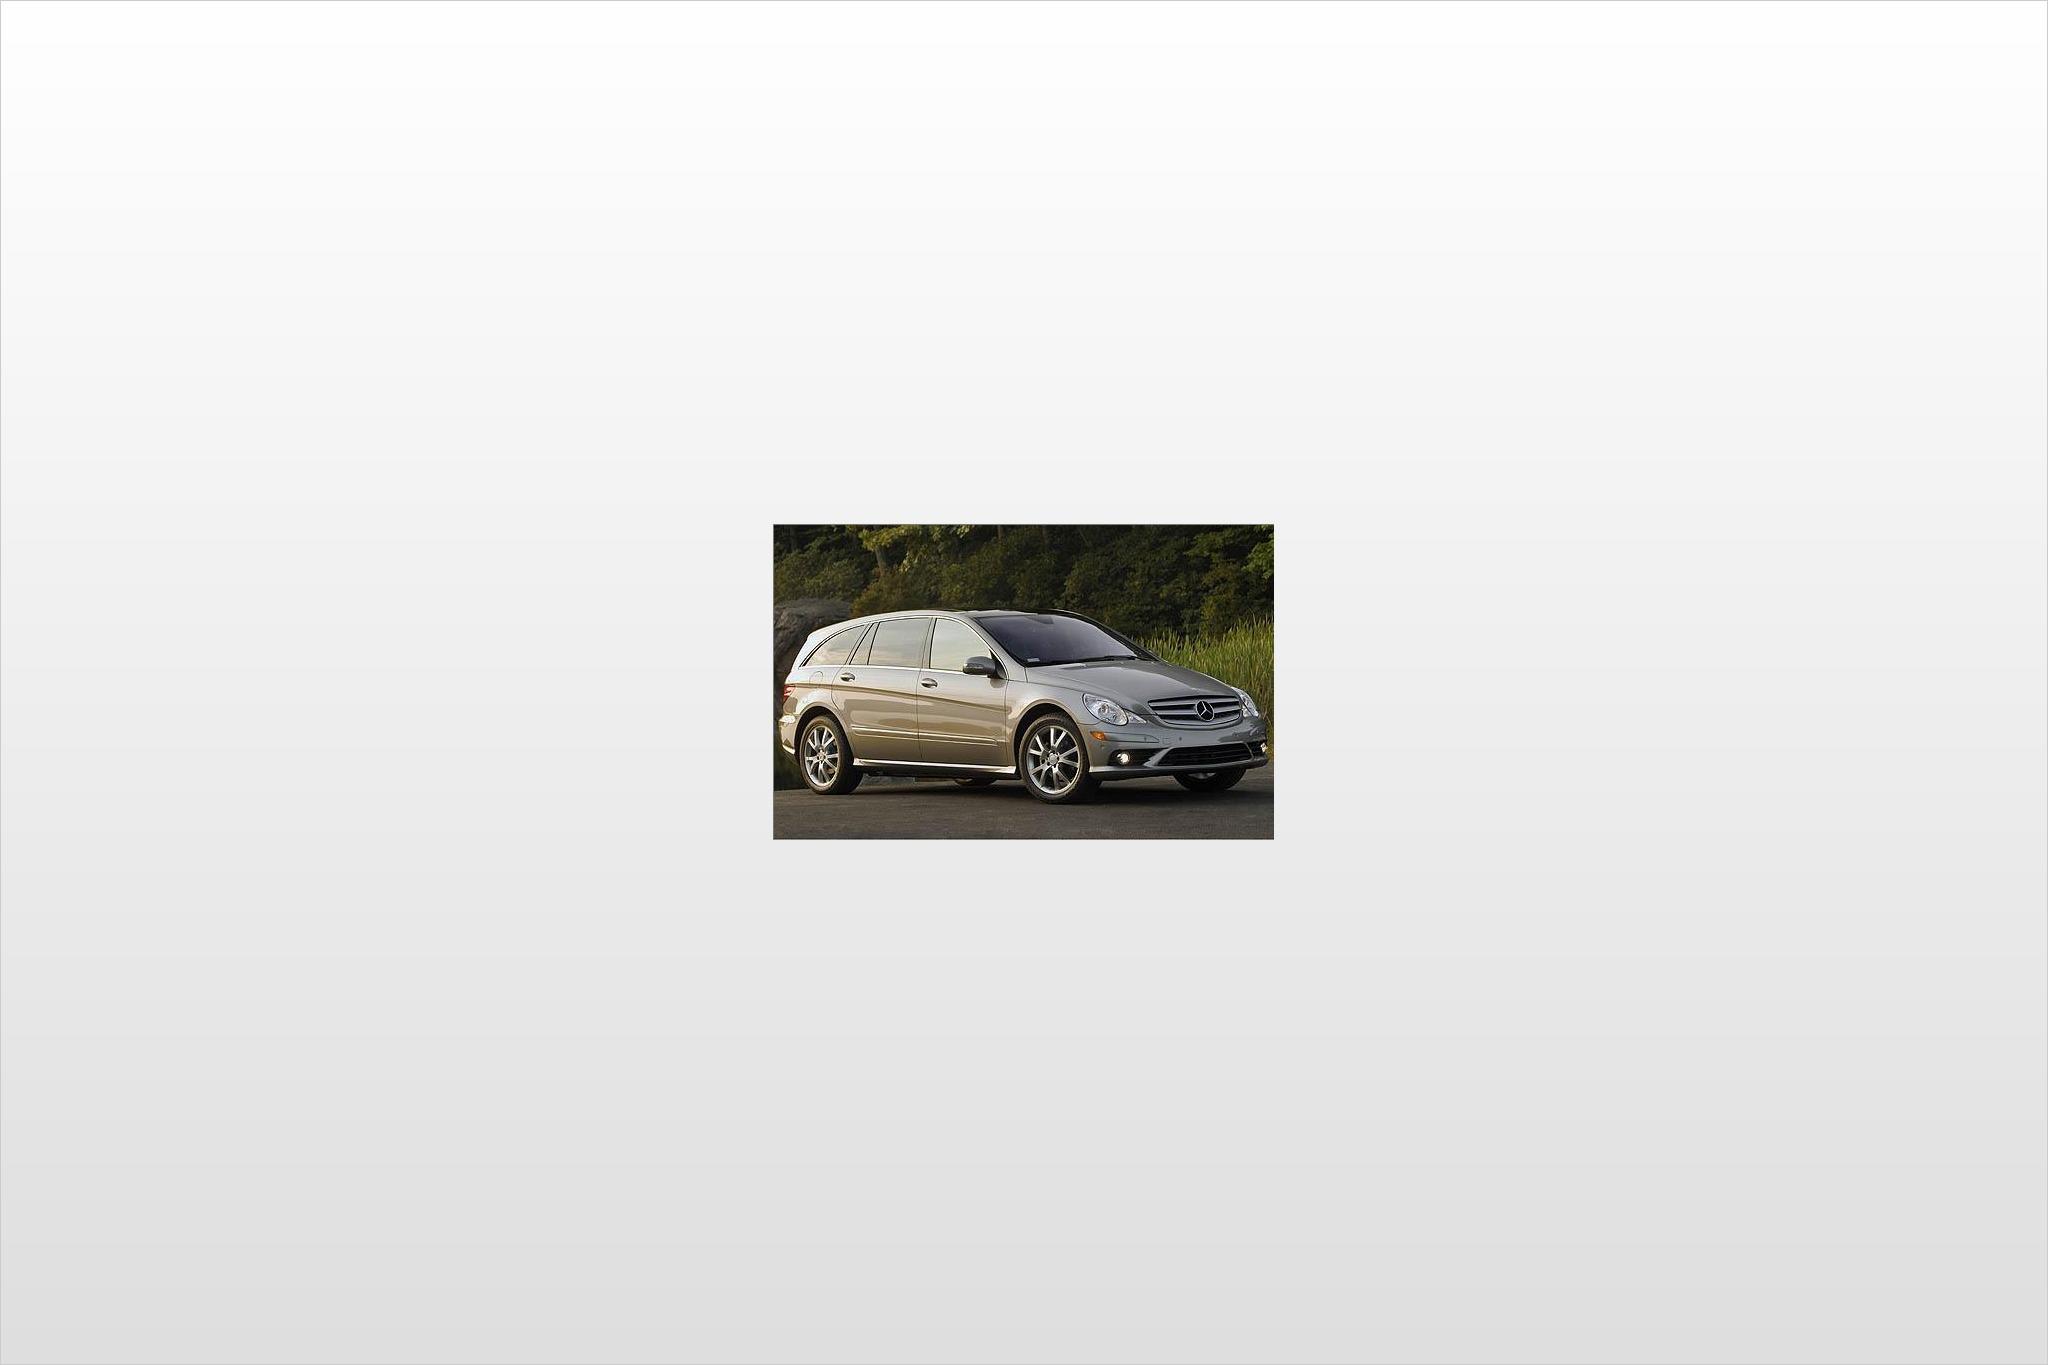 2010 mercedes benz r class wagon r350 4matic fq oem 1 2048